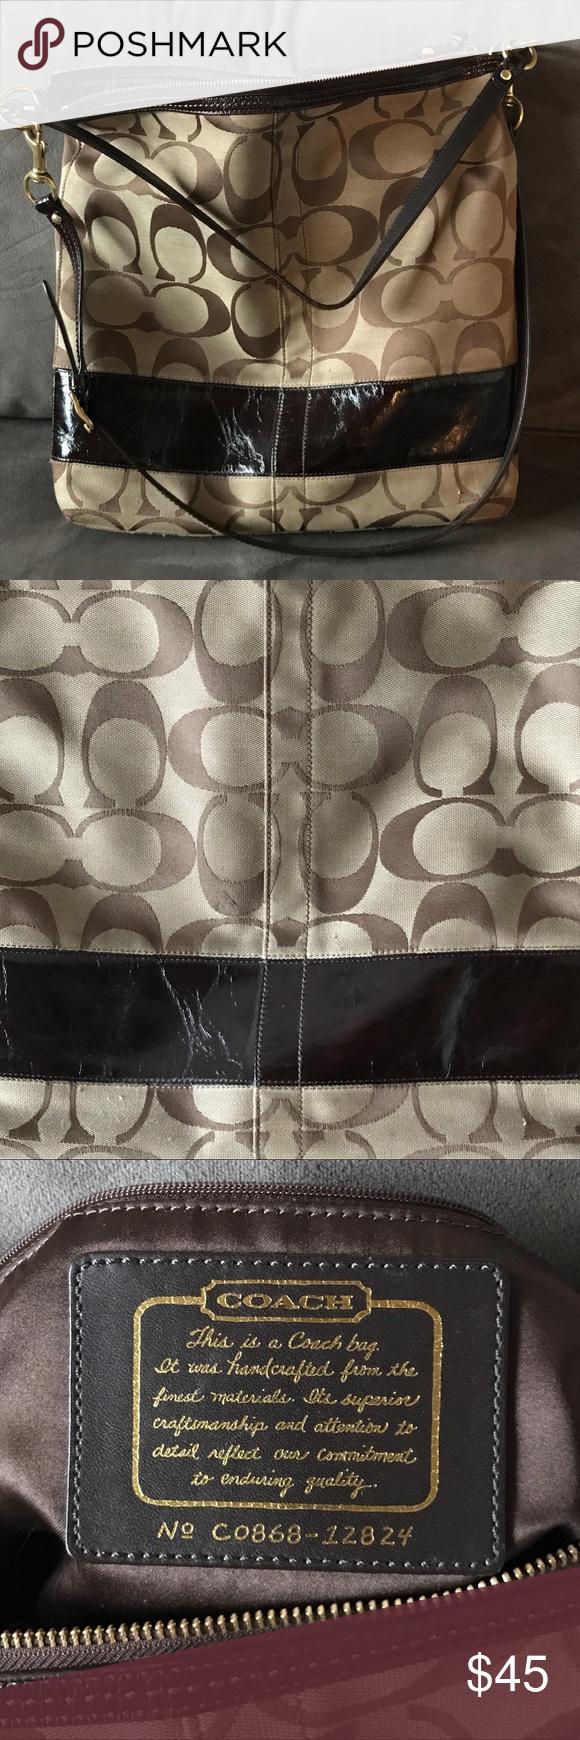 Authentic Coach large messenger bag purse Genuine Coach purse (868-12824)  in great cc21daafb8b7e